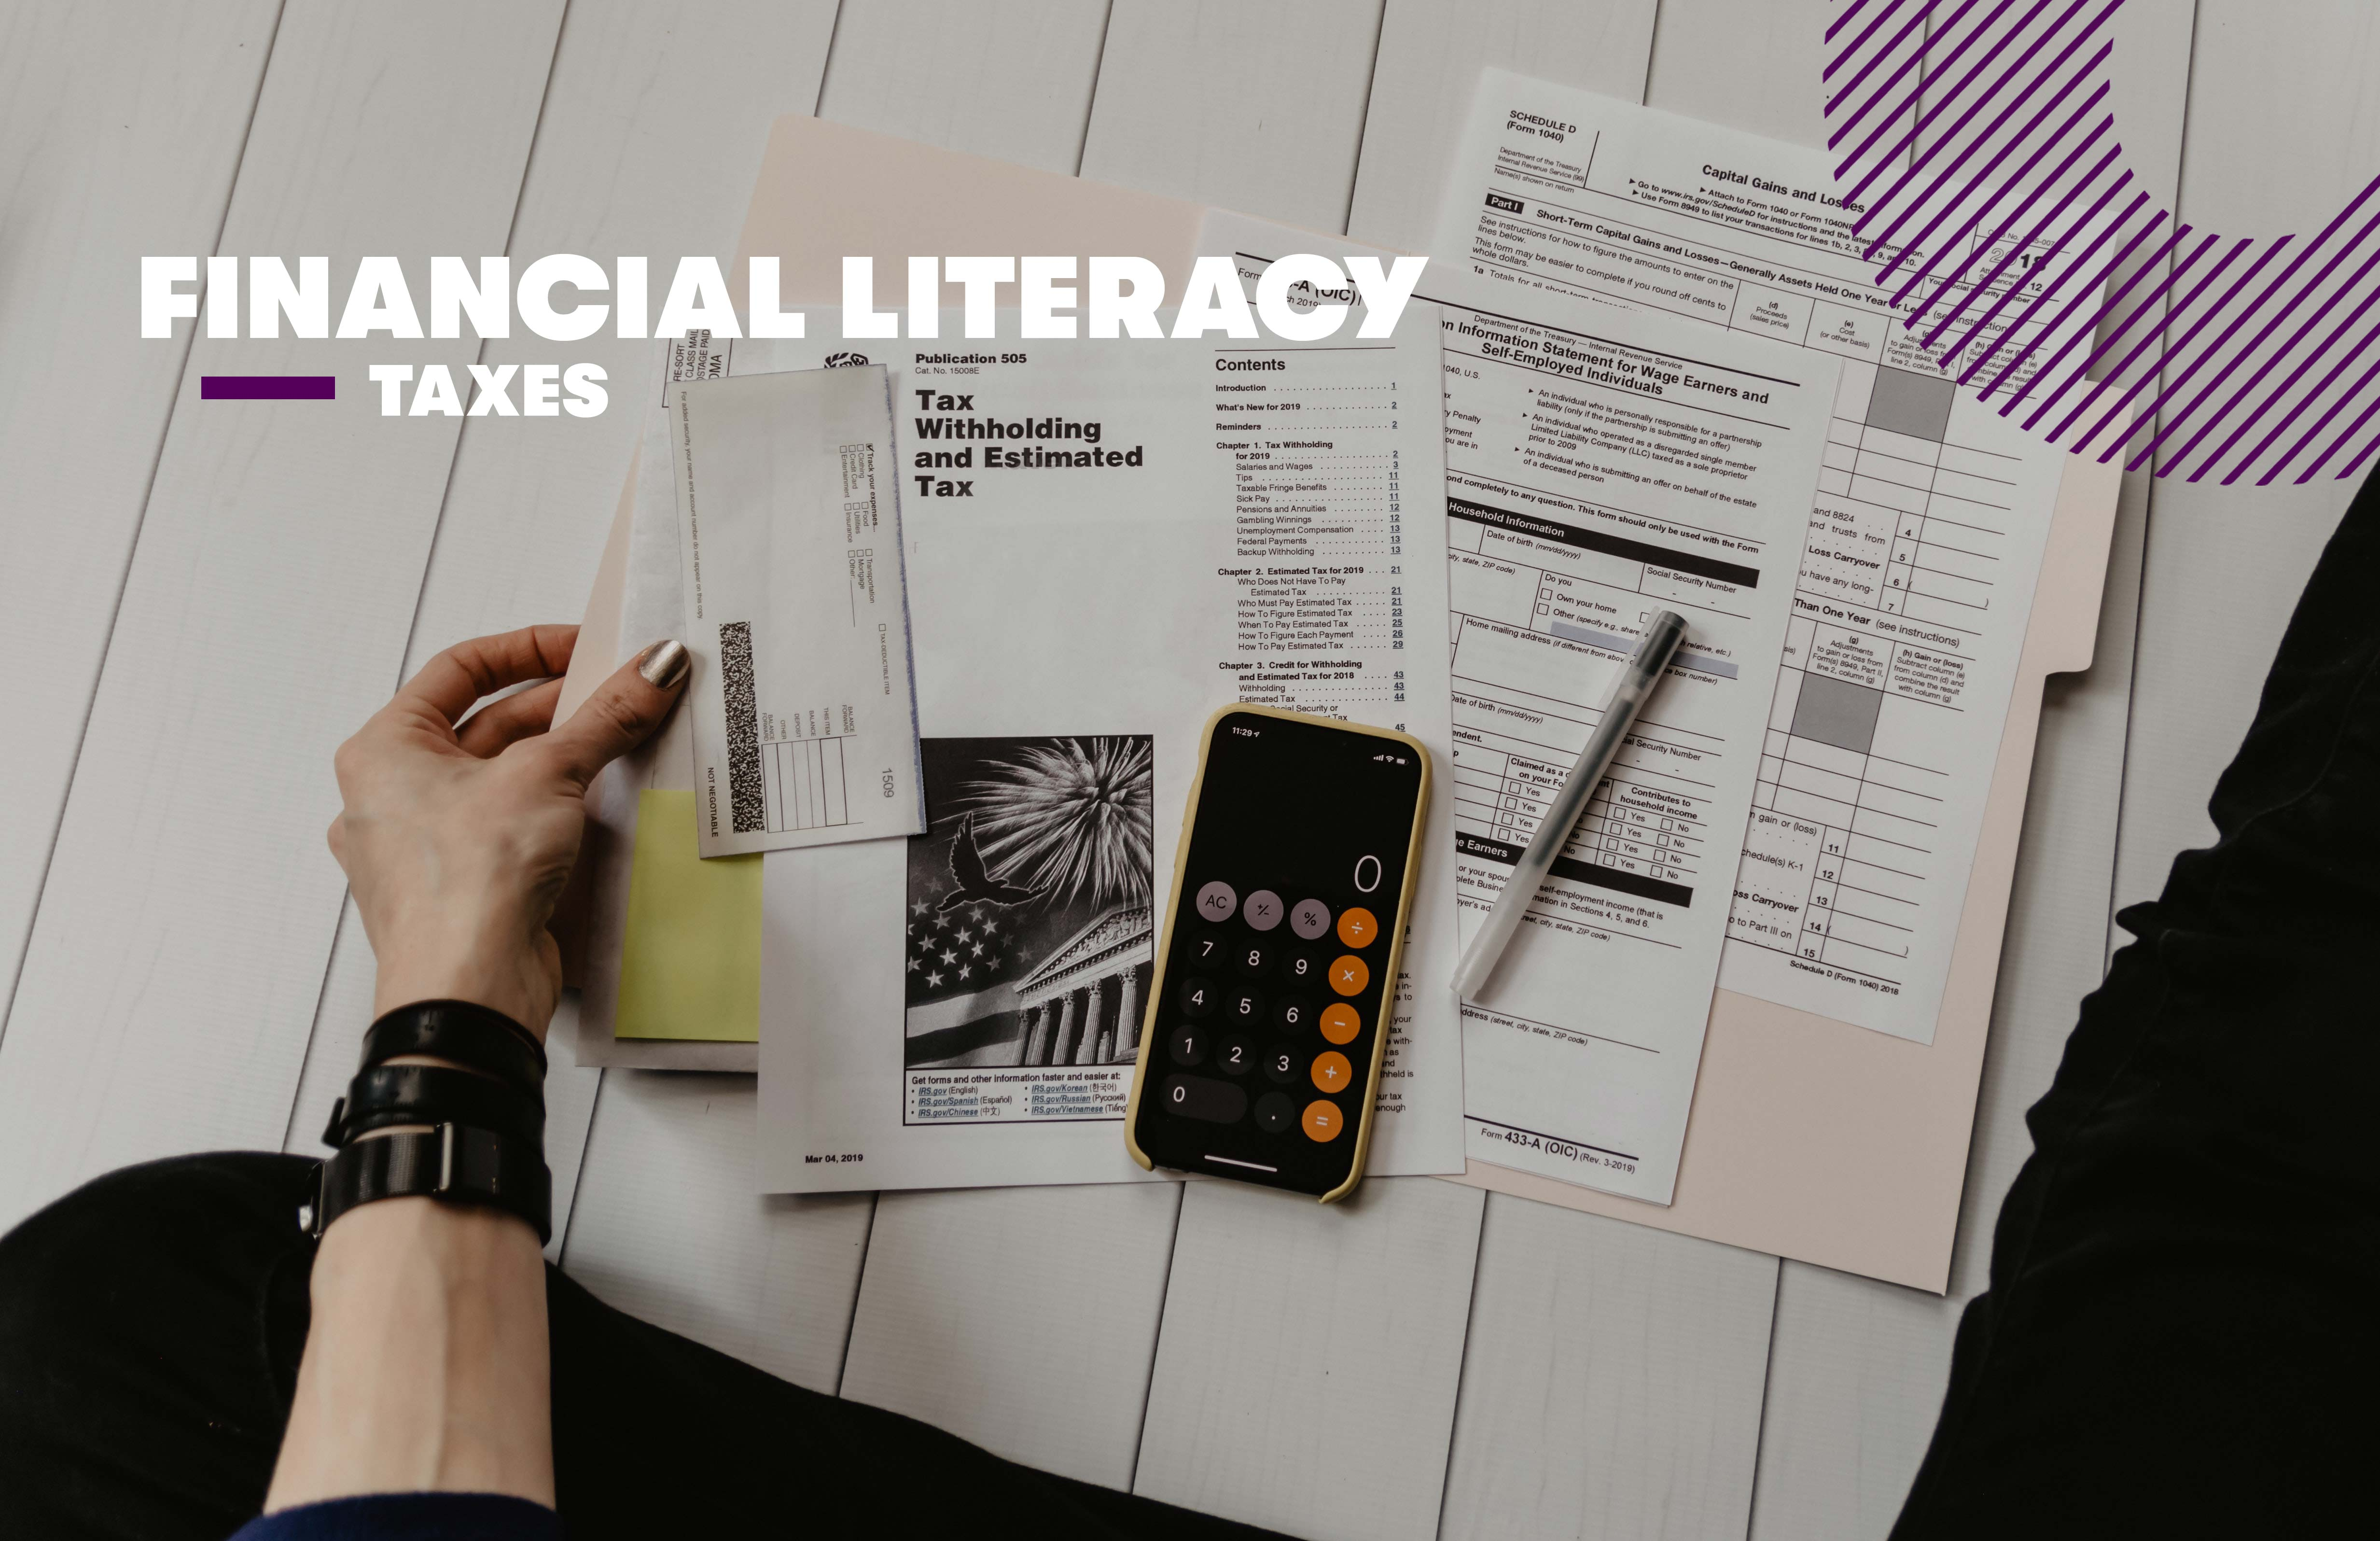 Financial Literacy - Taxes